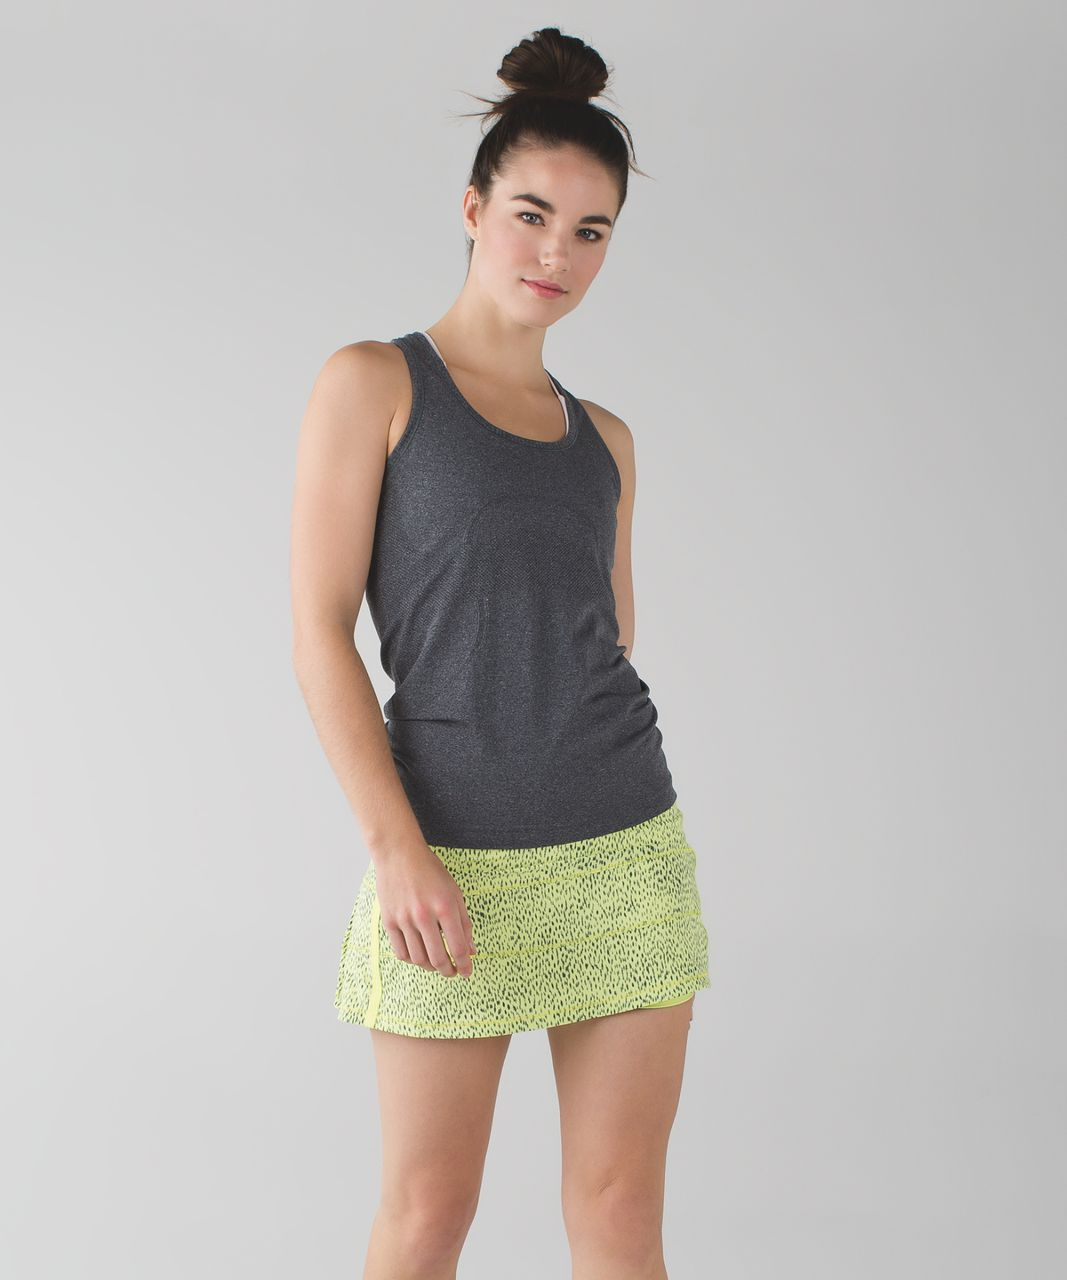 Lululemon Pace Rival Skirt II *4-way Stretch (Regular) - Dottie Dash Clarity Yellow Black / Clarity Yellow